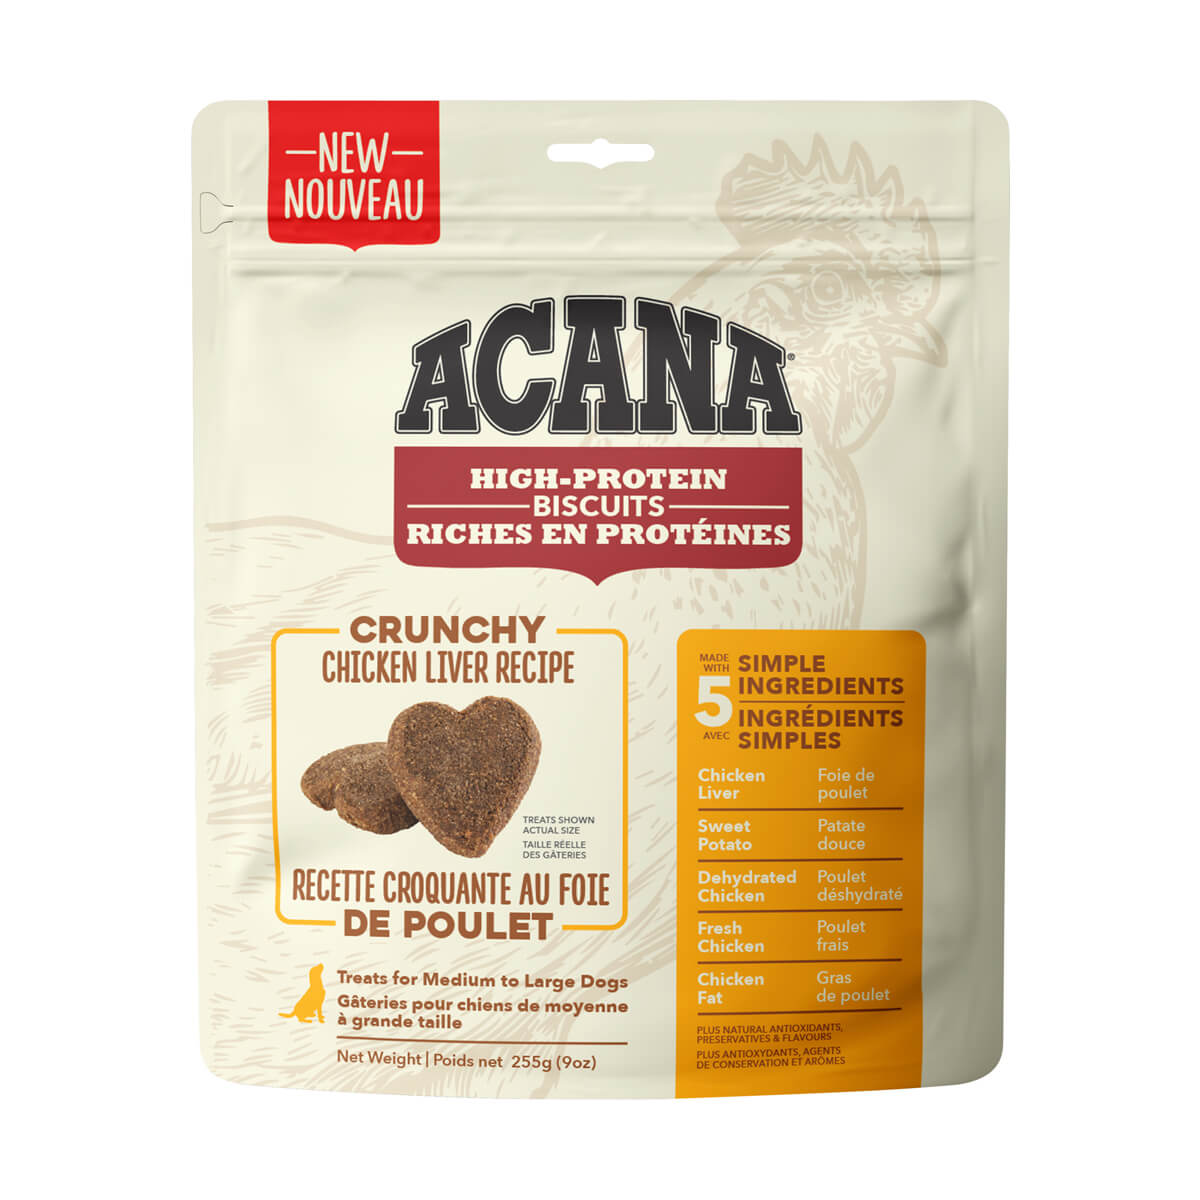 Acana High Protein Large Crunchy Chicken Liver Biscuits